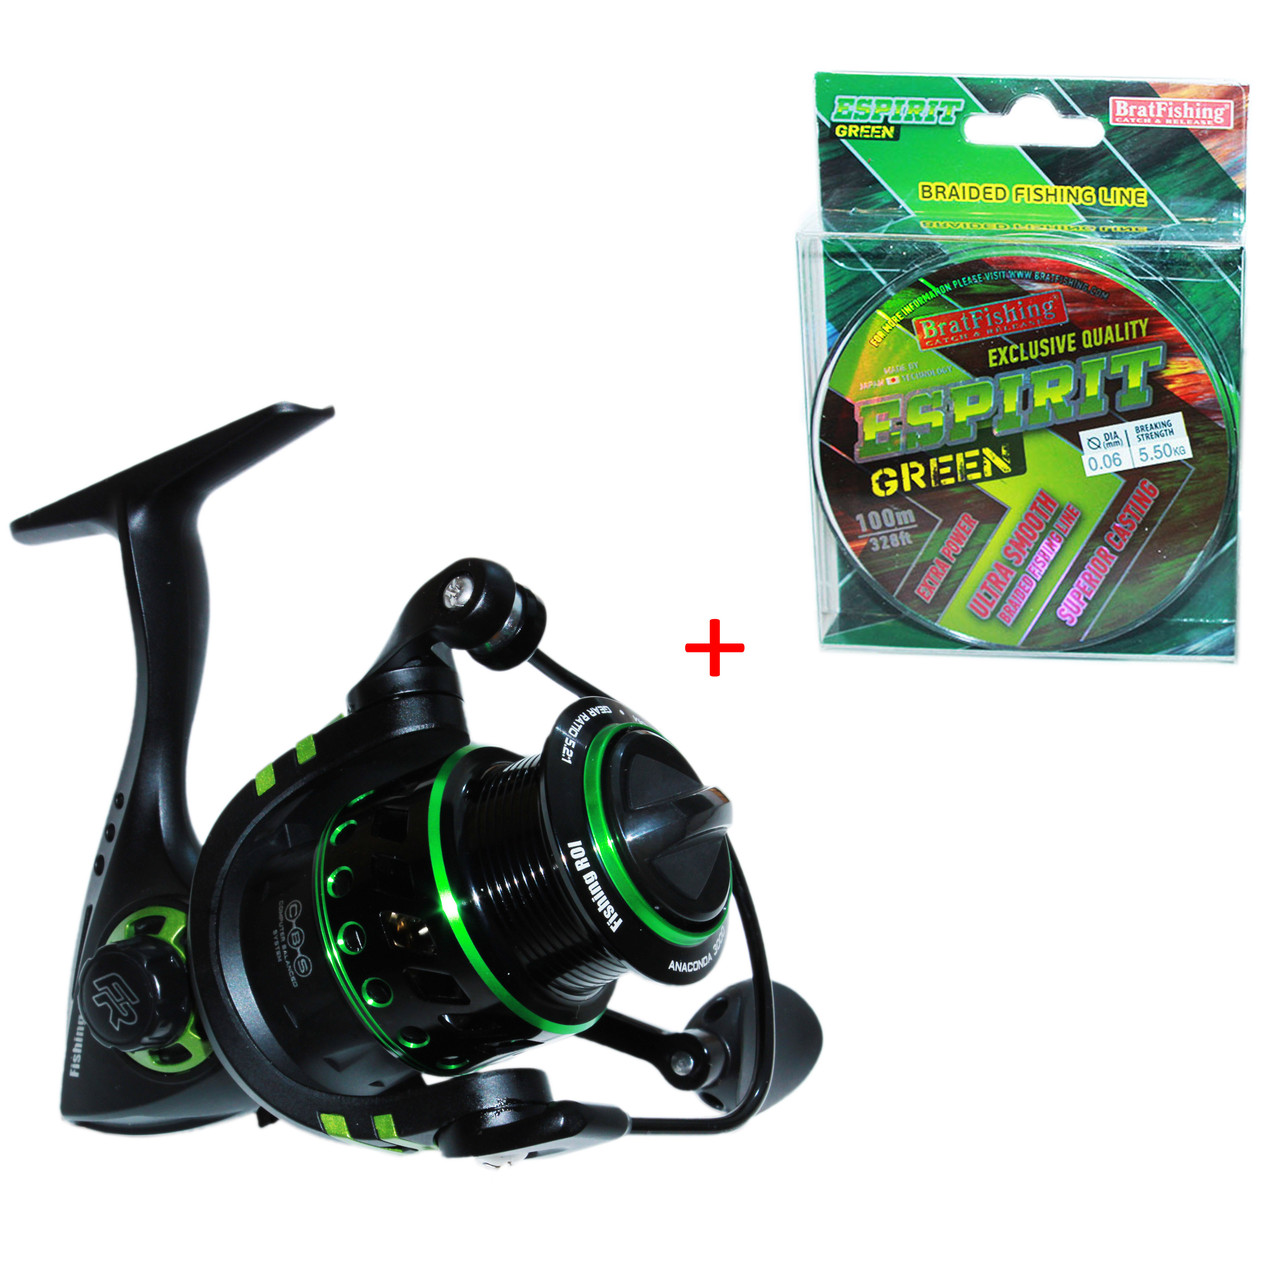 Катушка Fishing ROI Anaconda 2000 FD (5+1) + Шнур Рыболовный BratFishing Espirit Green (8 жил)